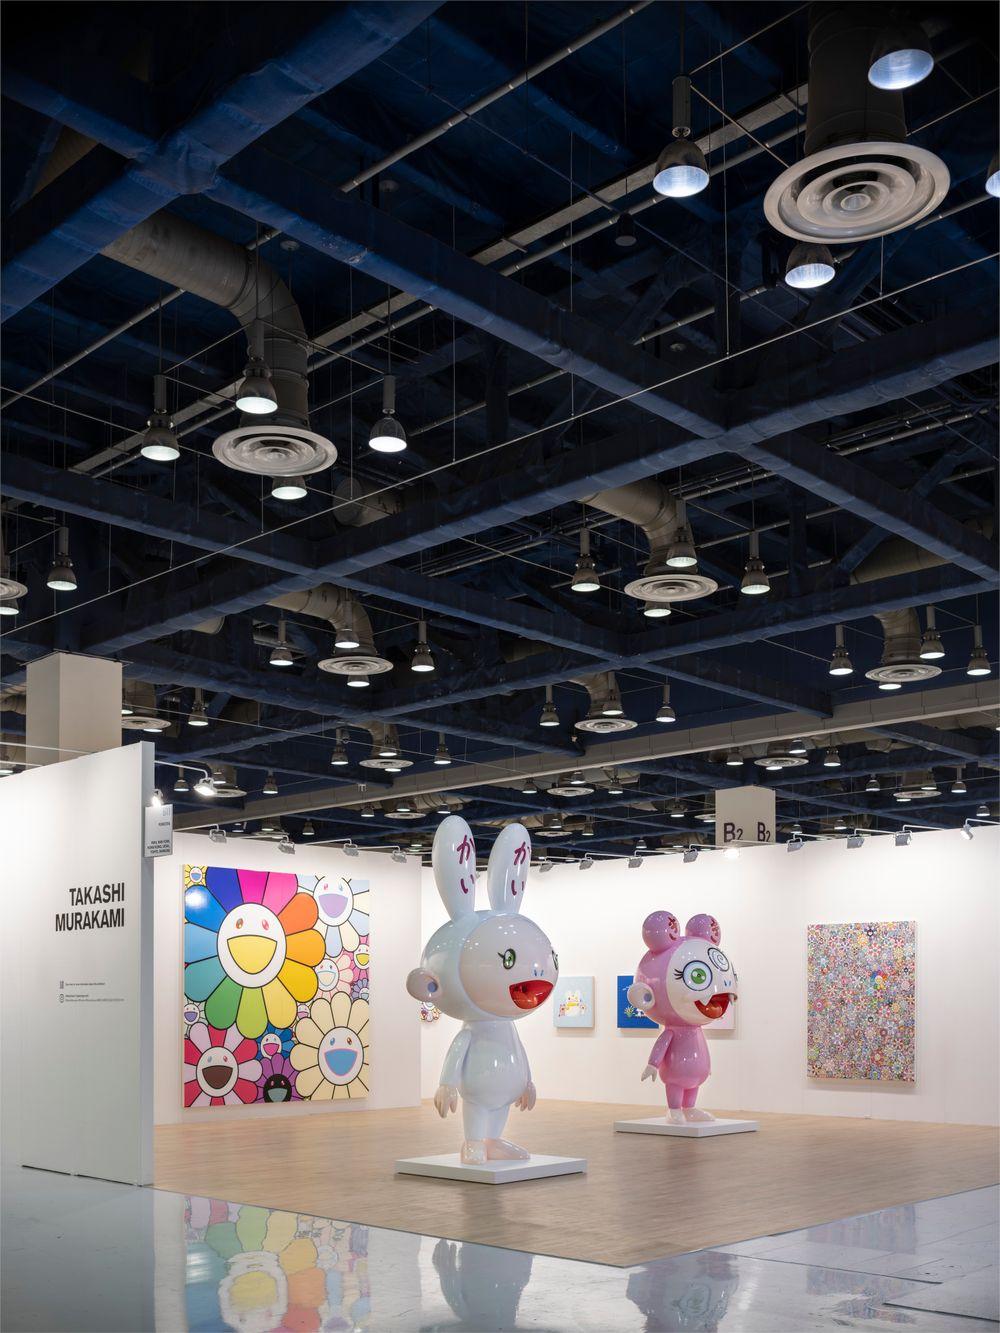 Artist:Takashi MURAKAMI, Exhibition:KIAF Seoul